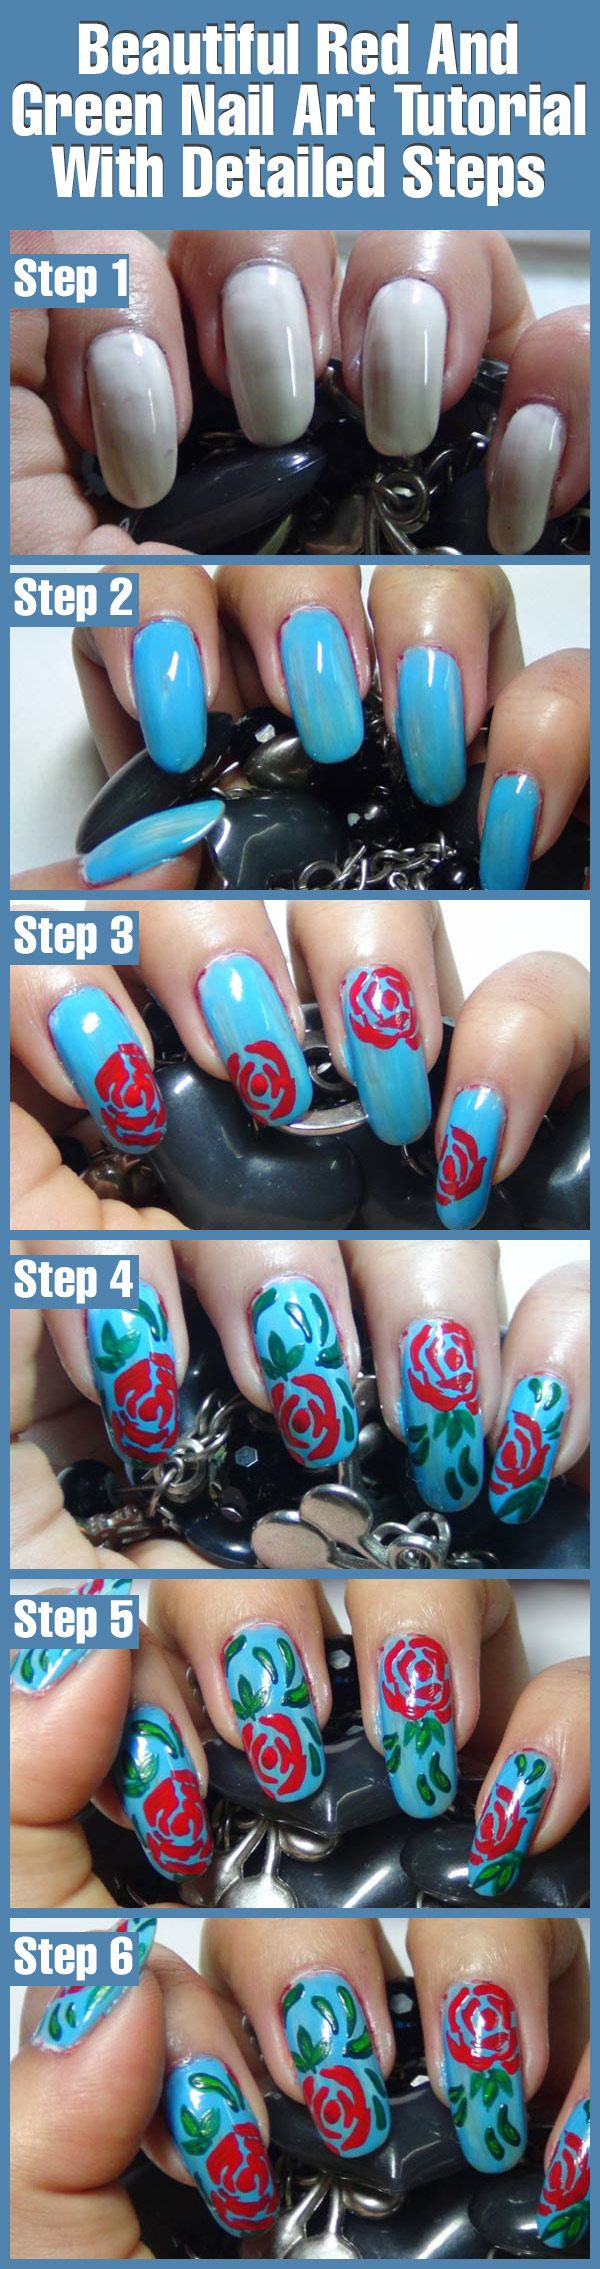 515 best Nail Art Tutorials images on Pinterest | Nail design, Nail ...